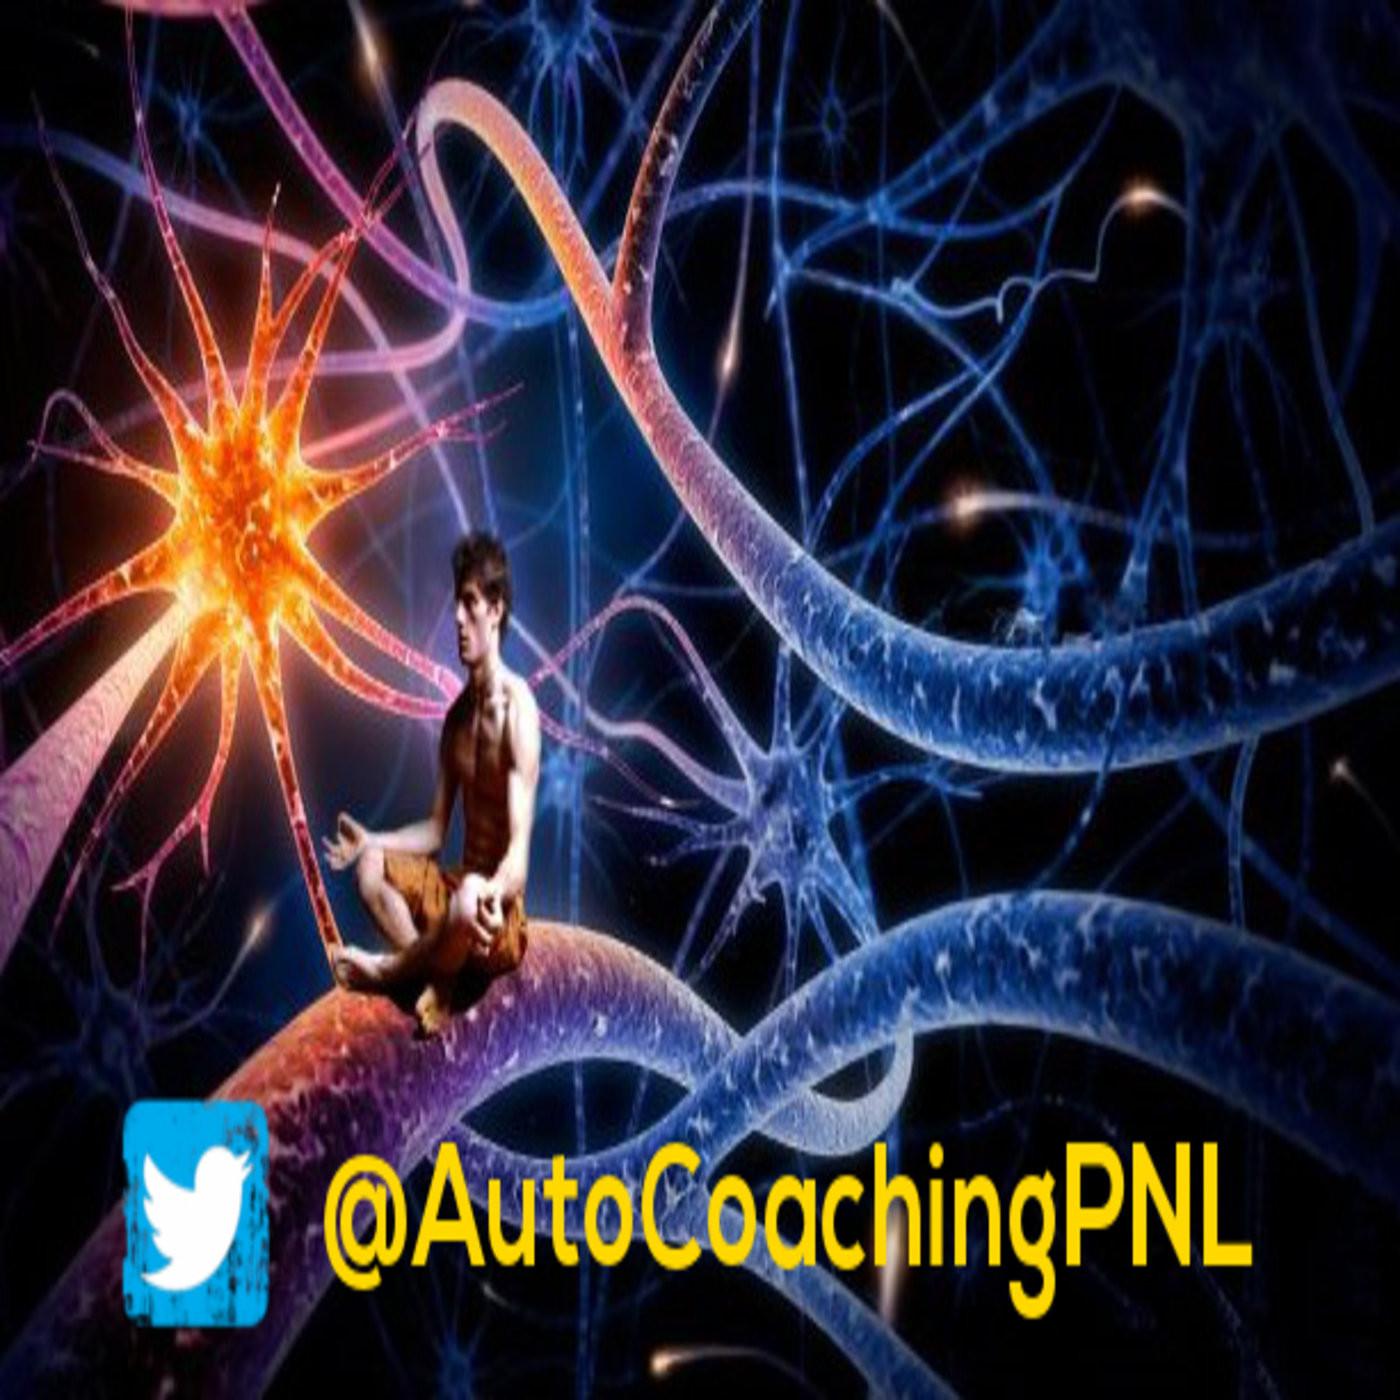 <![CDATA[Auto Coaching PNL]]>